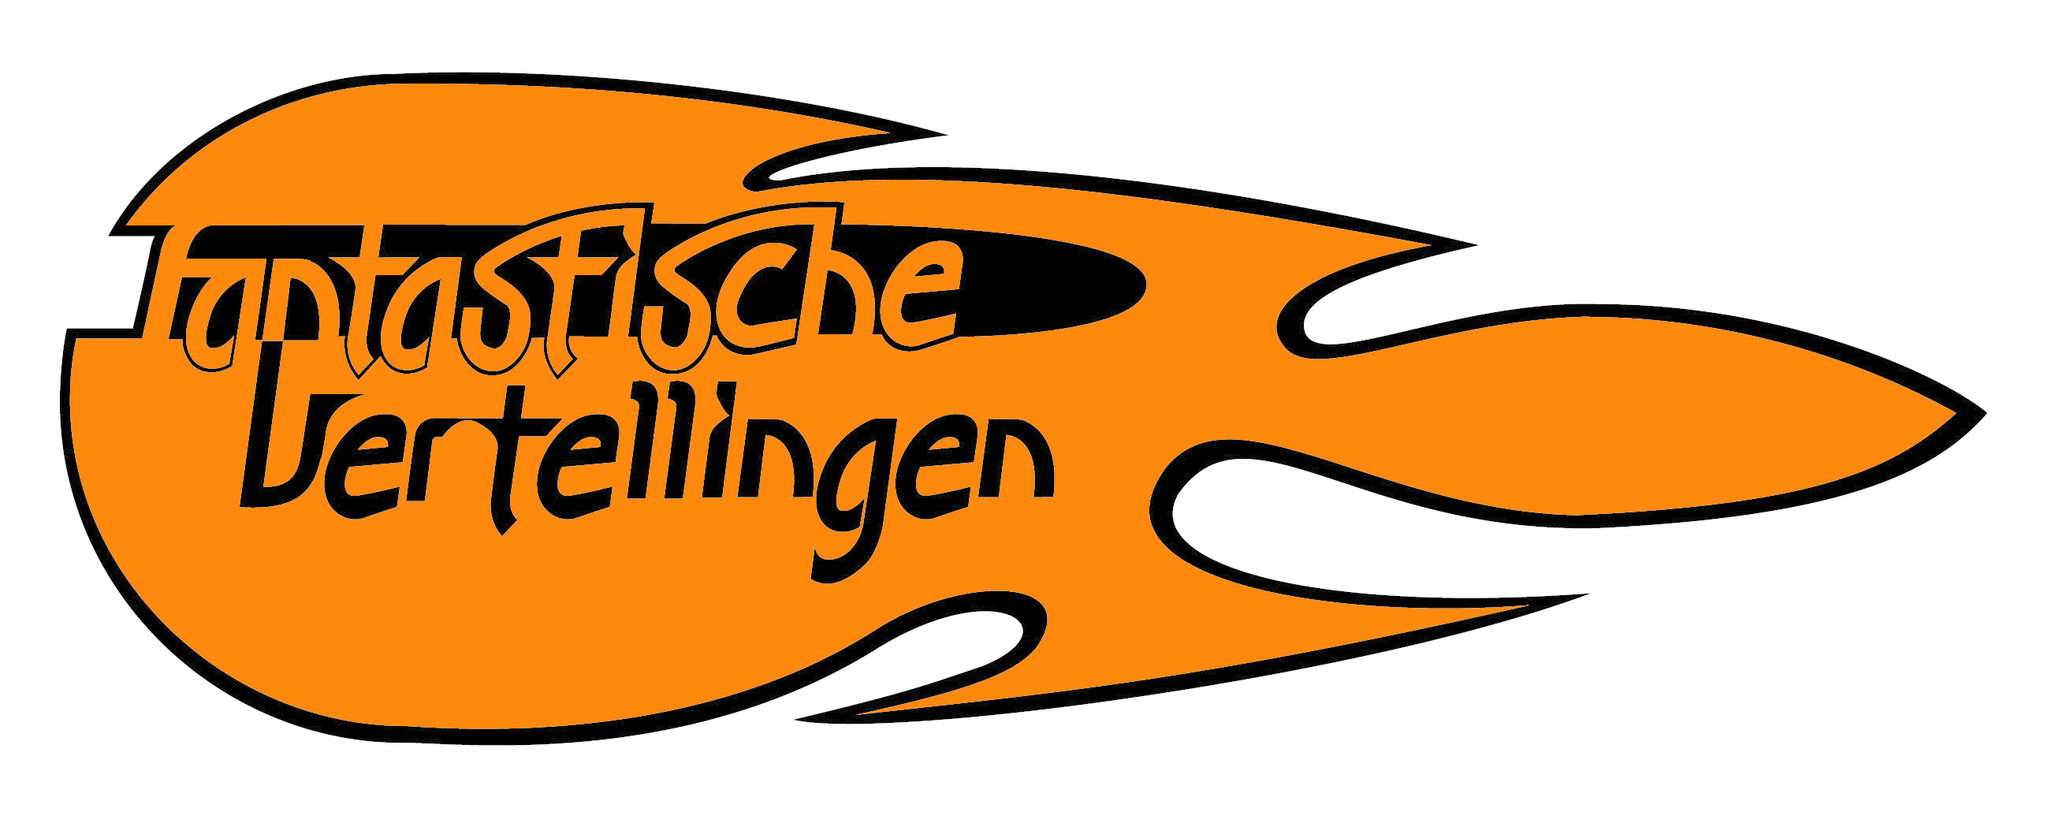 logo Fantastische Vertellingen